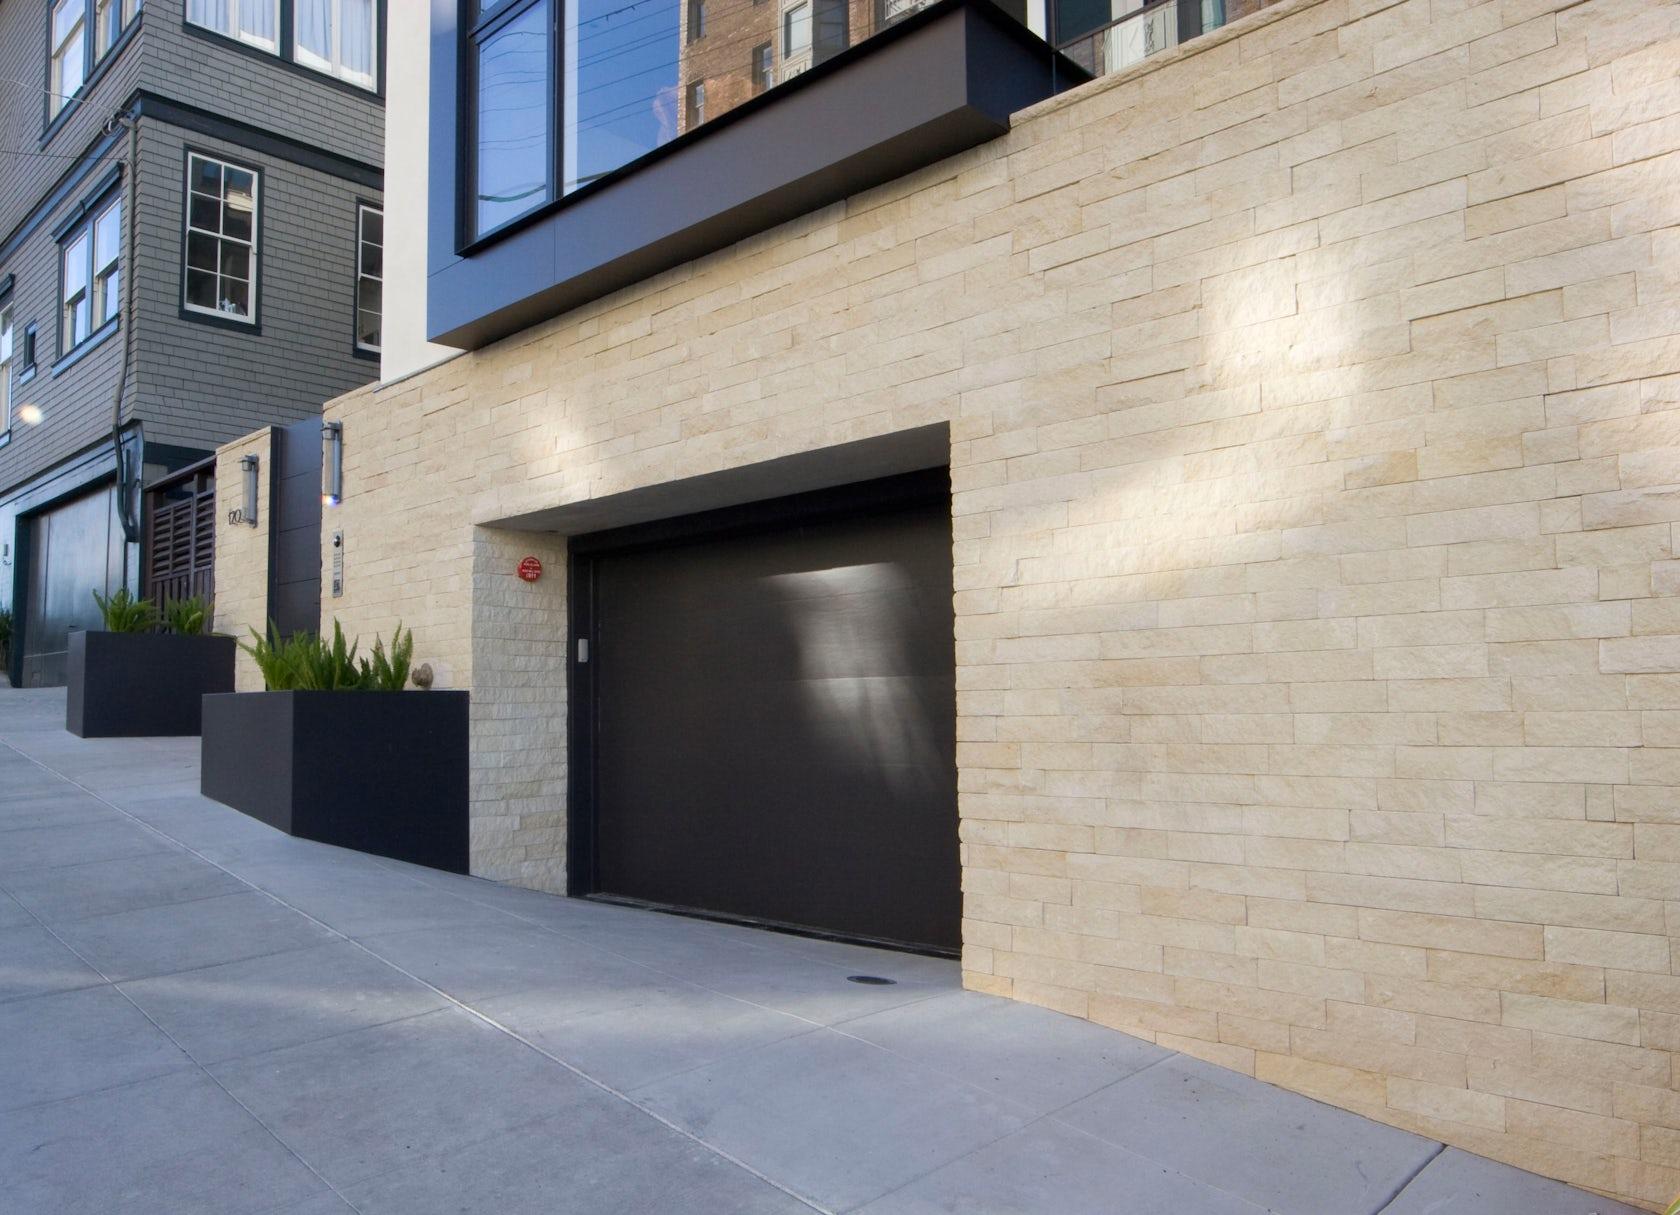 1215 #4A6181 John Maniscalco Architecture Architizer image Garage Doors Delaware 37431680